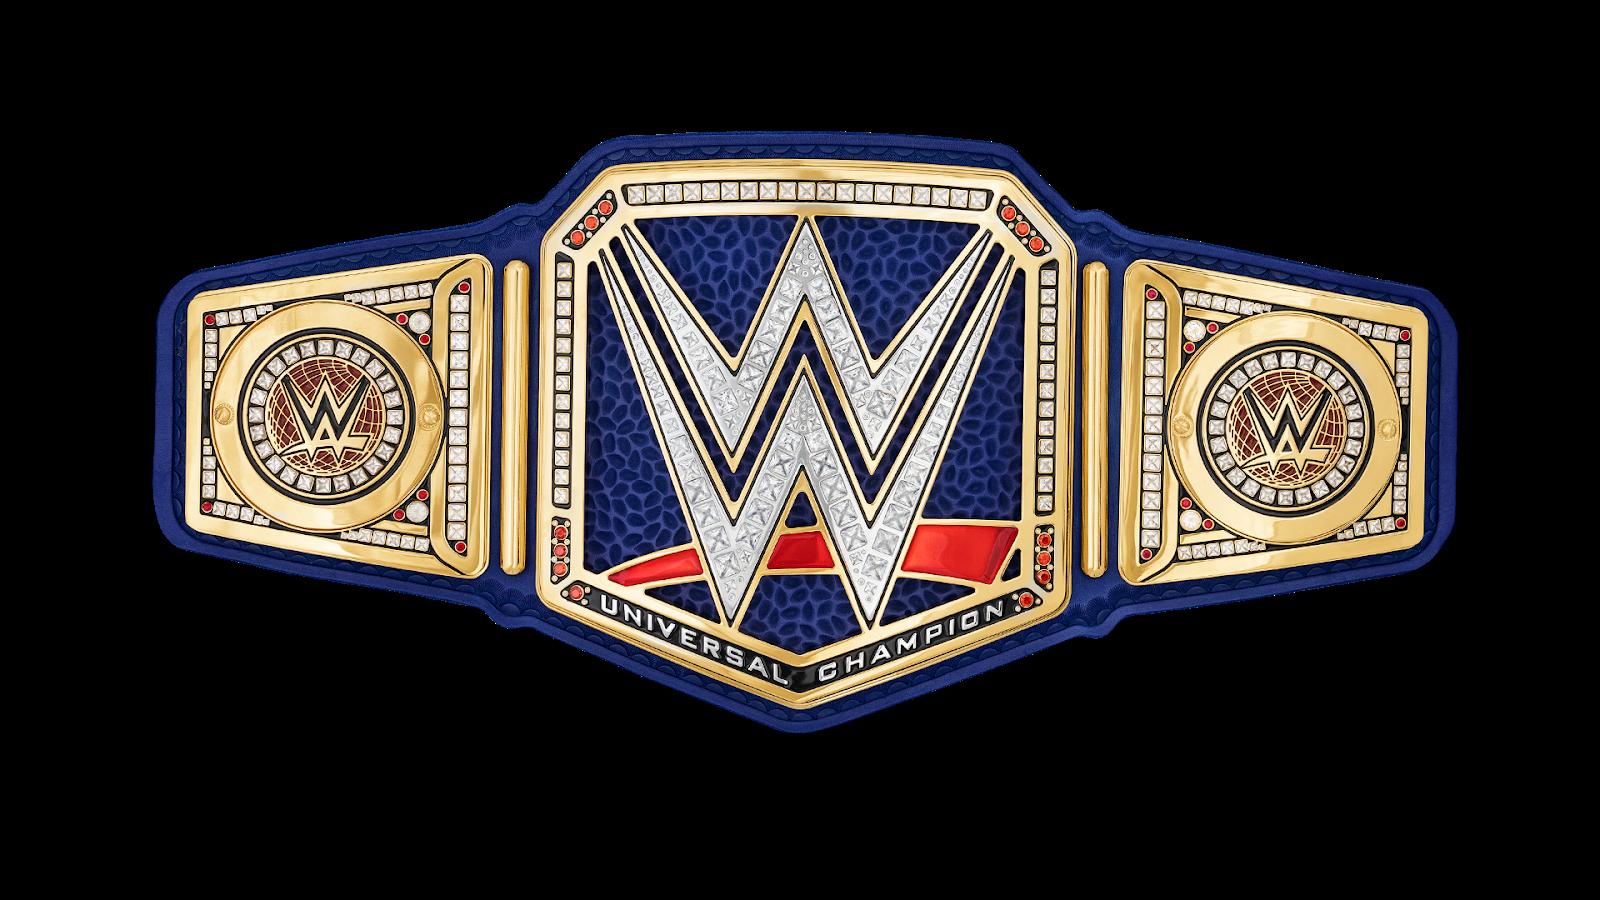 current WWE Universal champion title holder